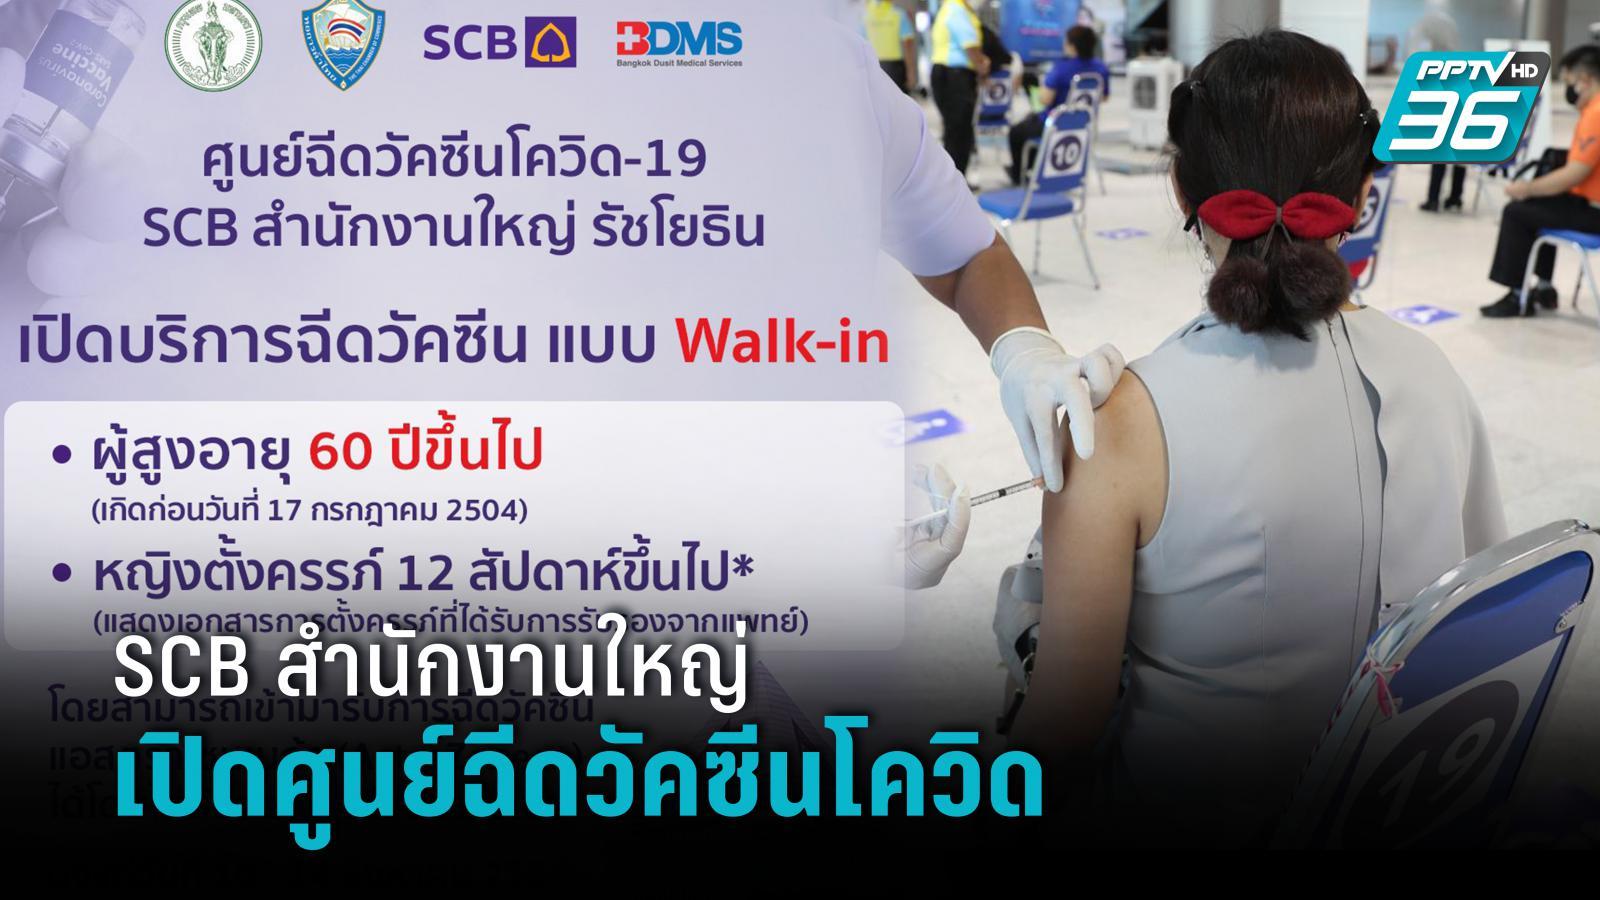 SCB  เปิดศูนย์ฉีดวัคซีนโควิด Walk-in ผู้สูงอายุ 60 ปีขึ้นไป